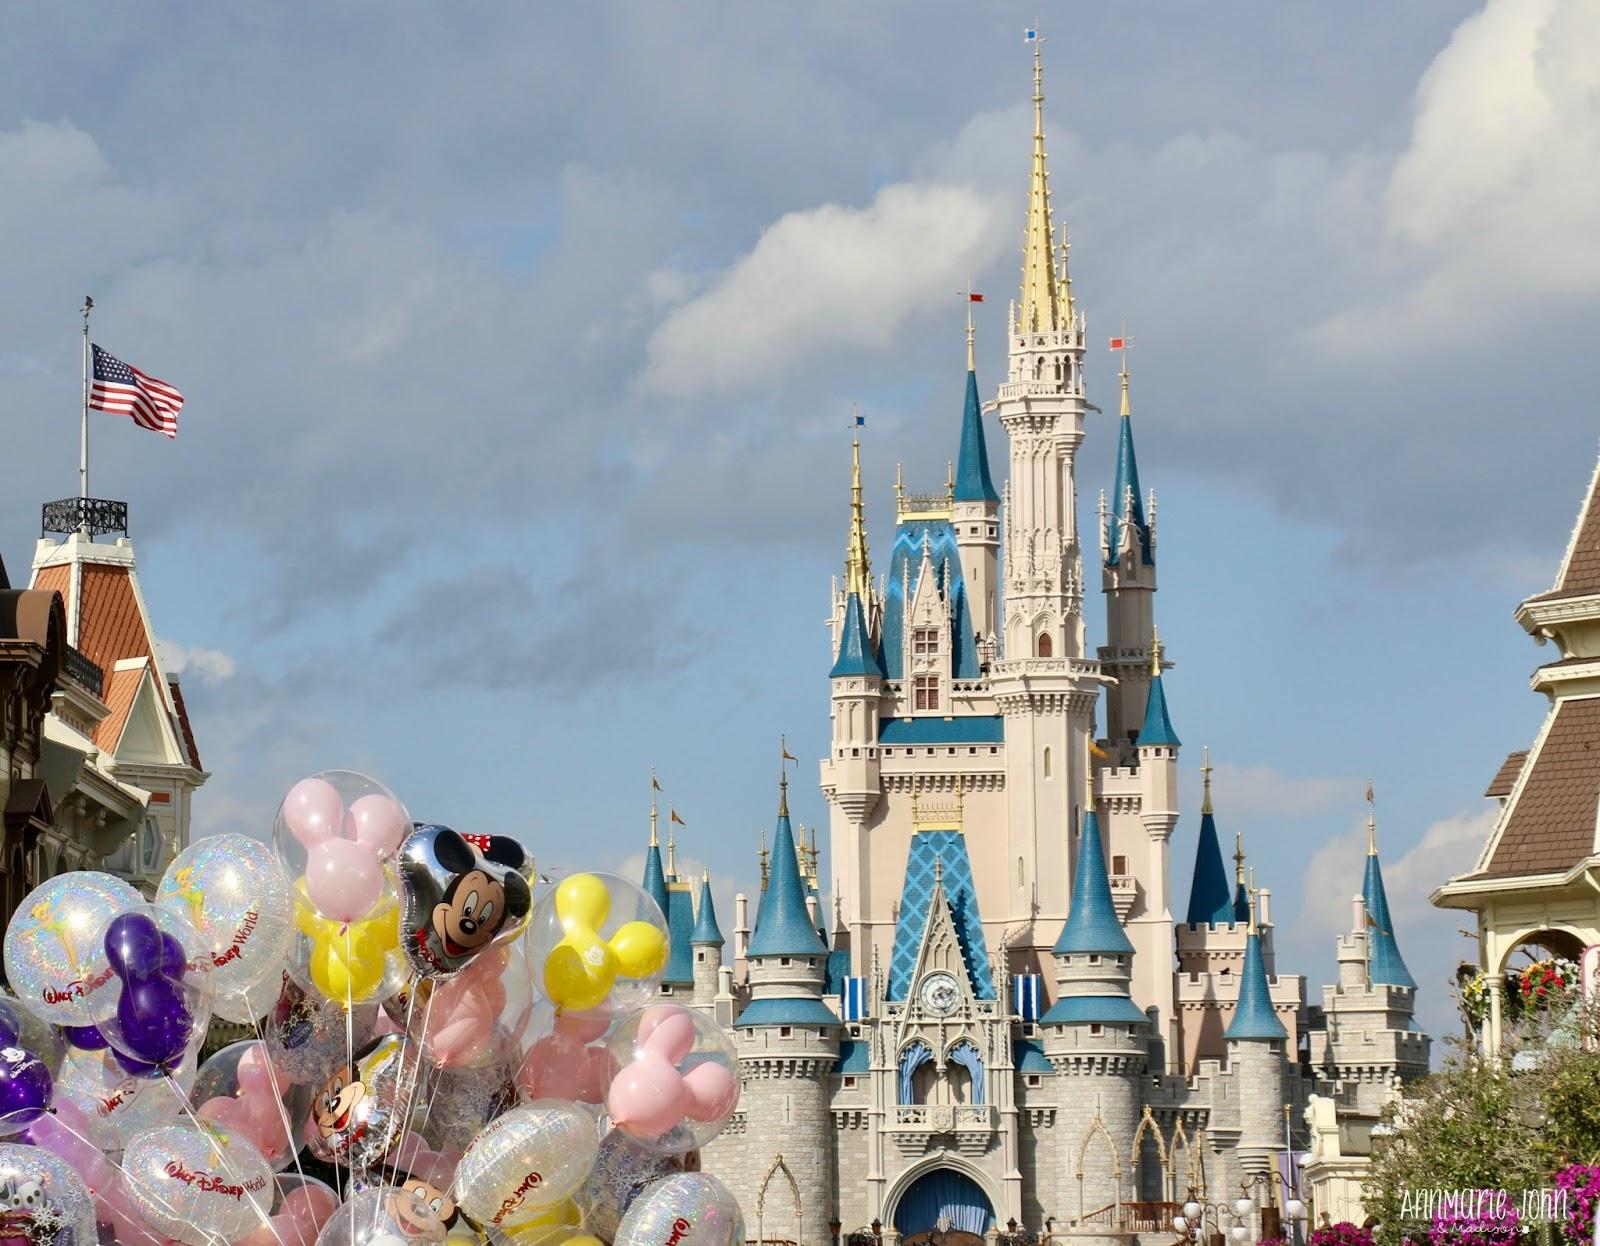 Welcome To Wdwnewscom! Home Of Everything Walt Disney - HD1600×1246